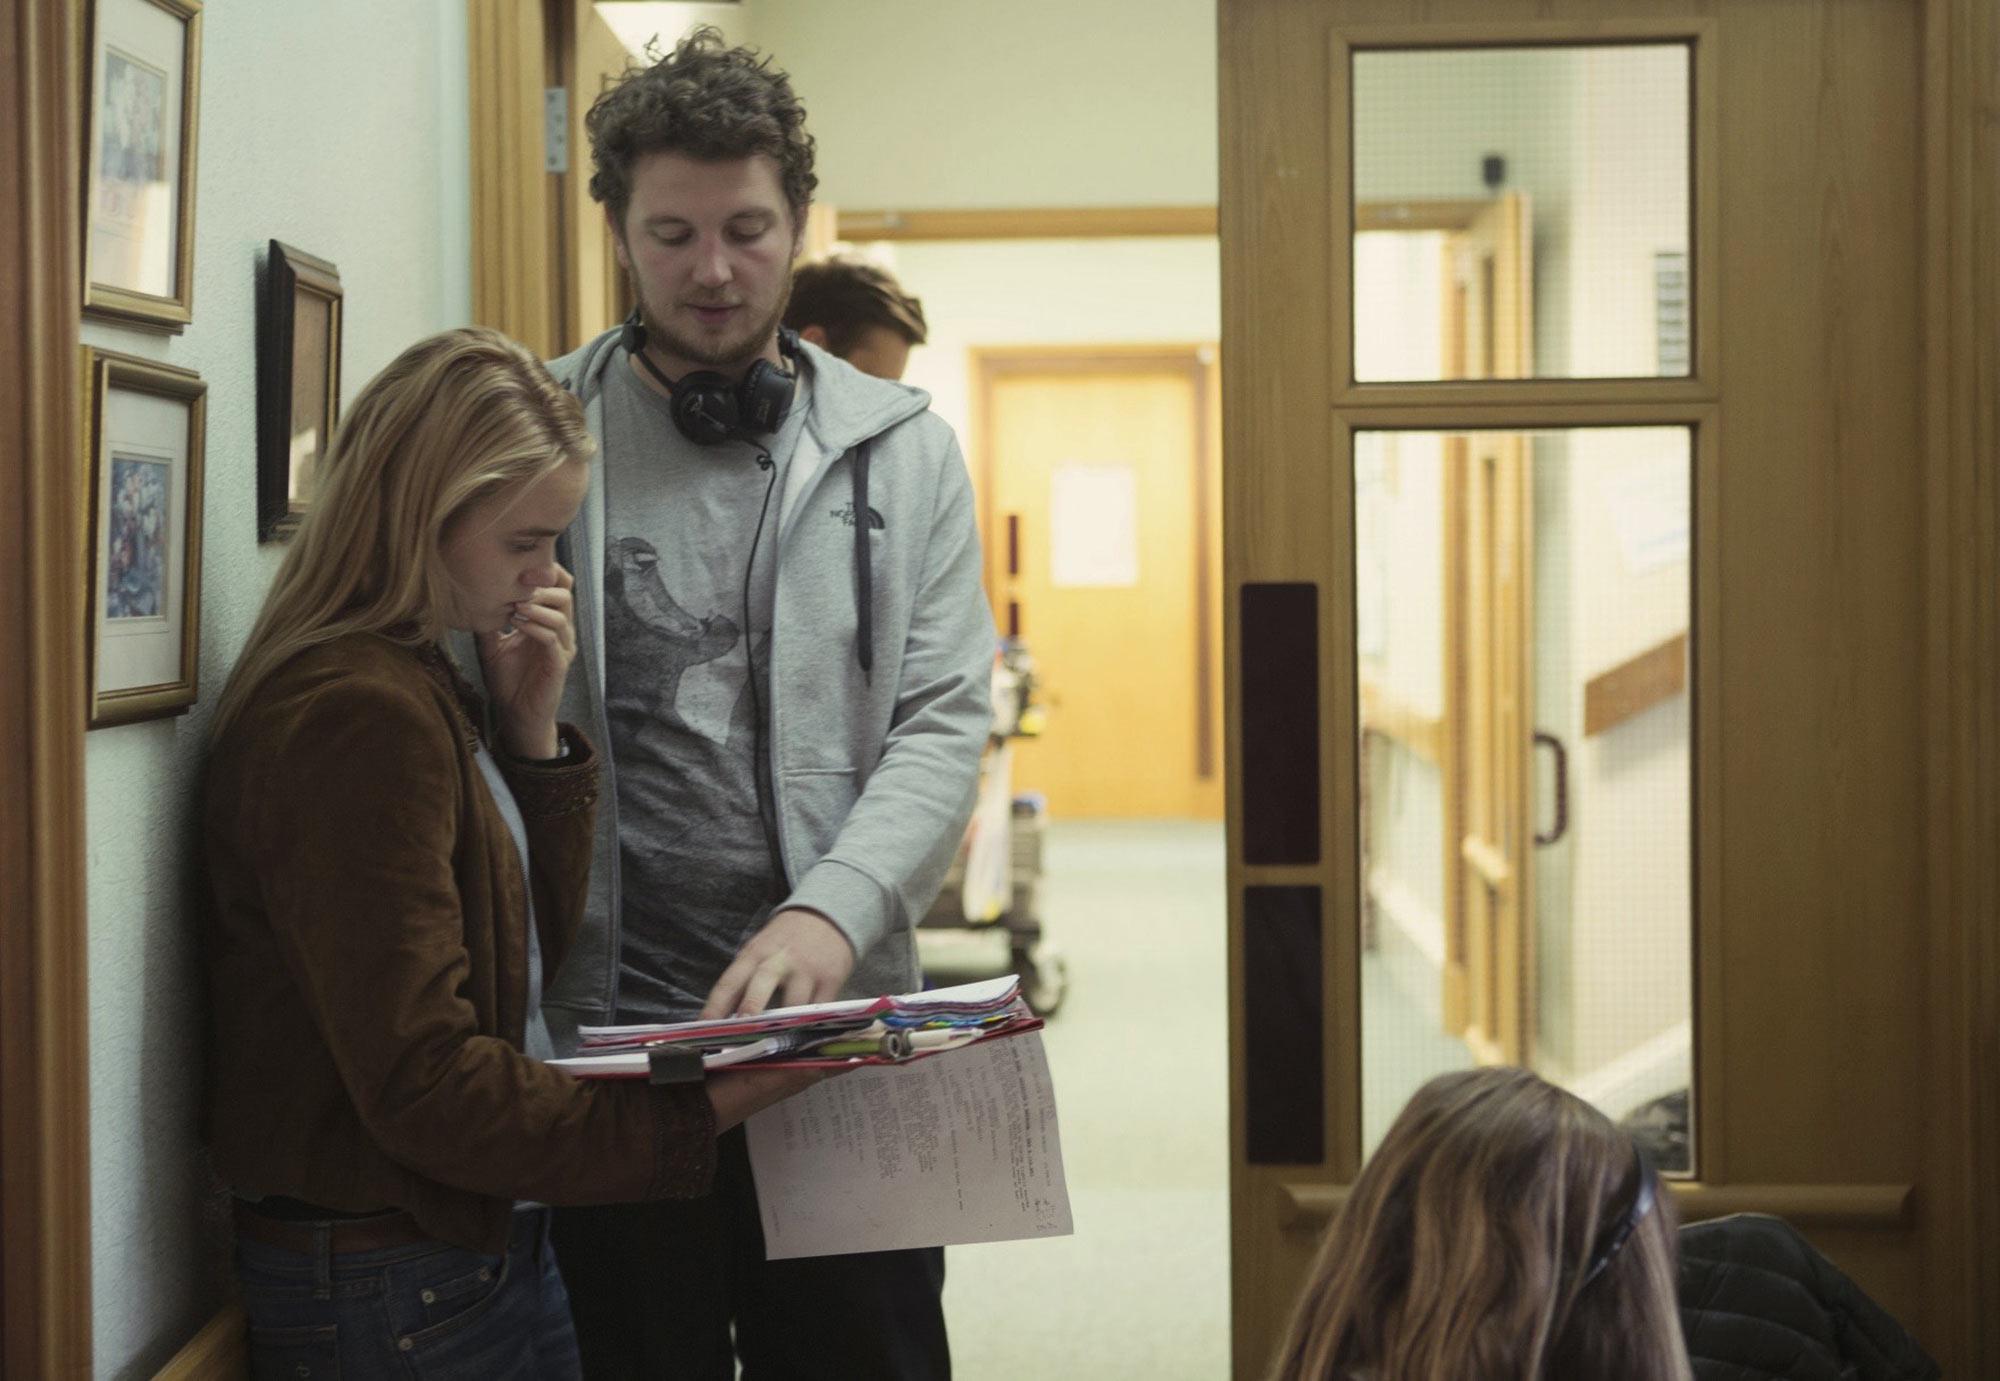 One of Us - Talking through a scene with Joanna Vanderham